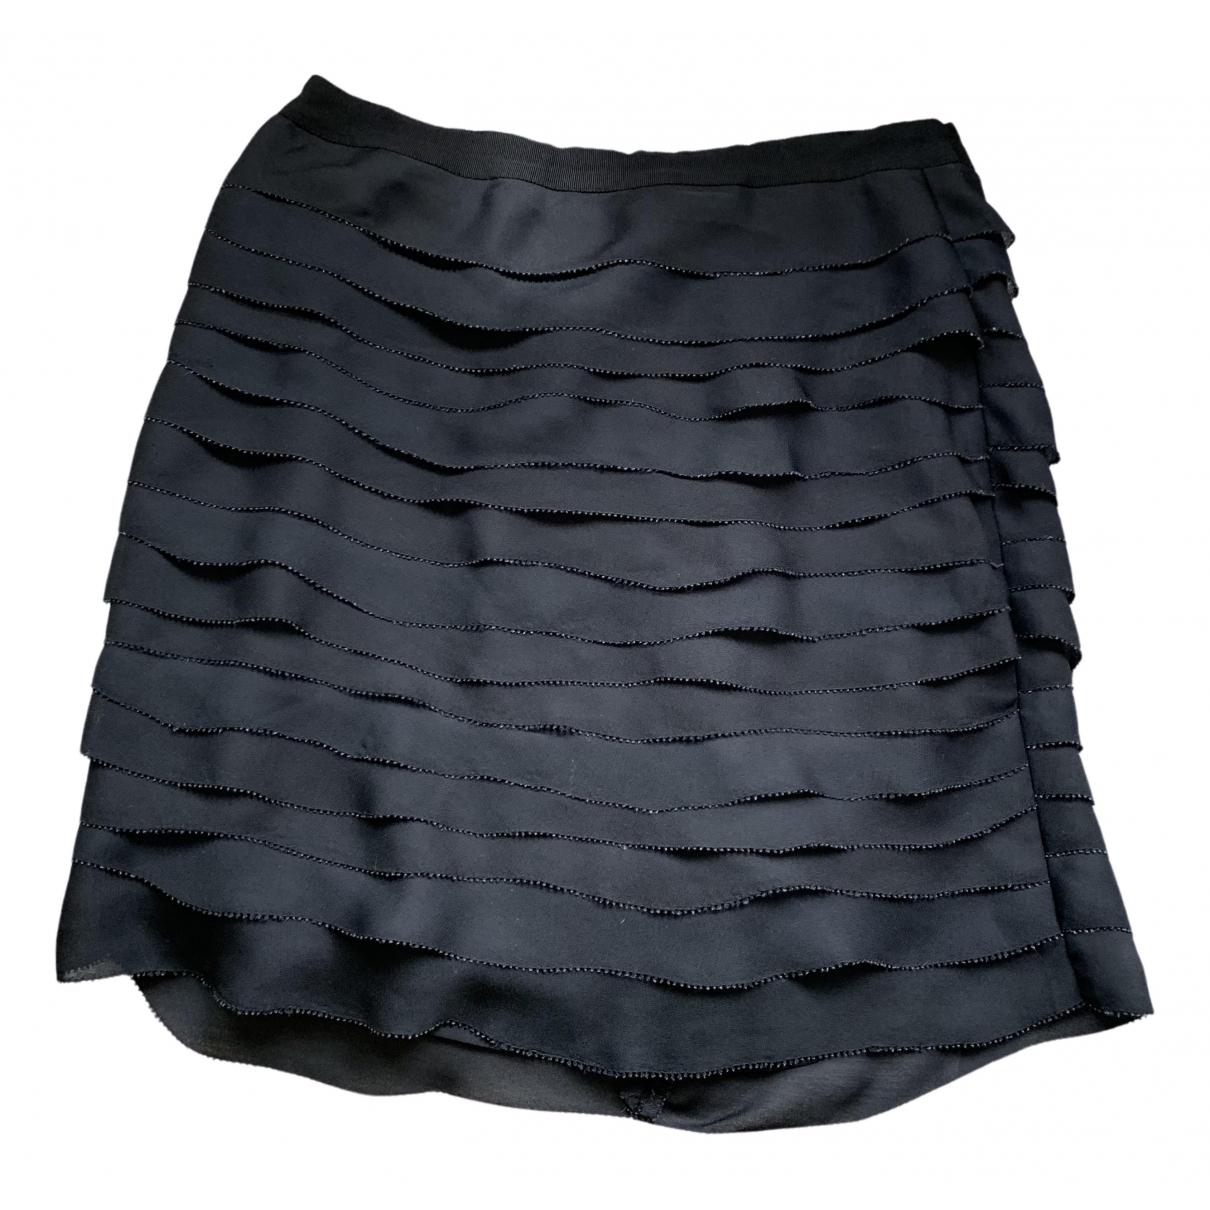 Emporio Armani \N Rocke in  Schwarz Polyester